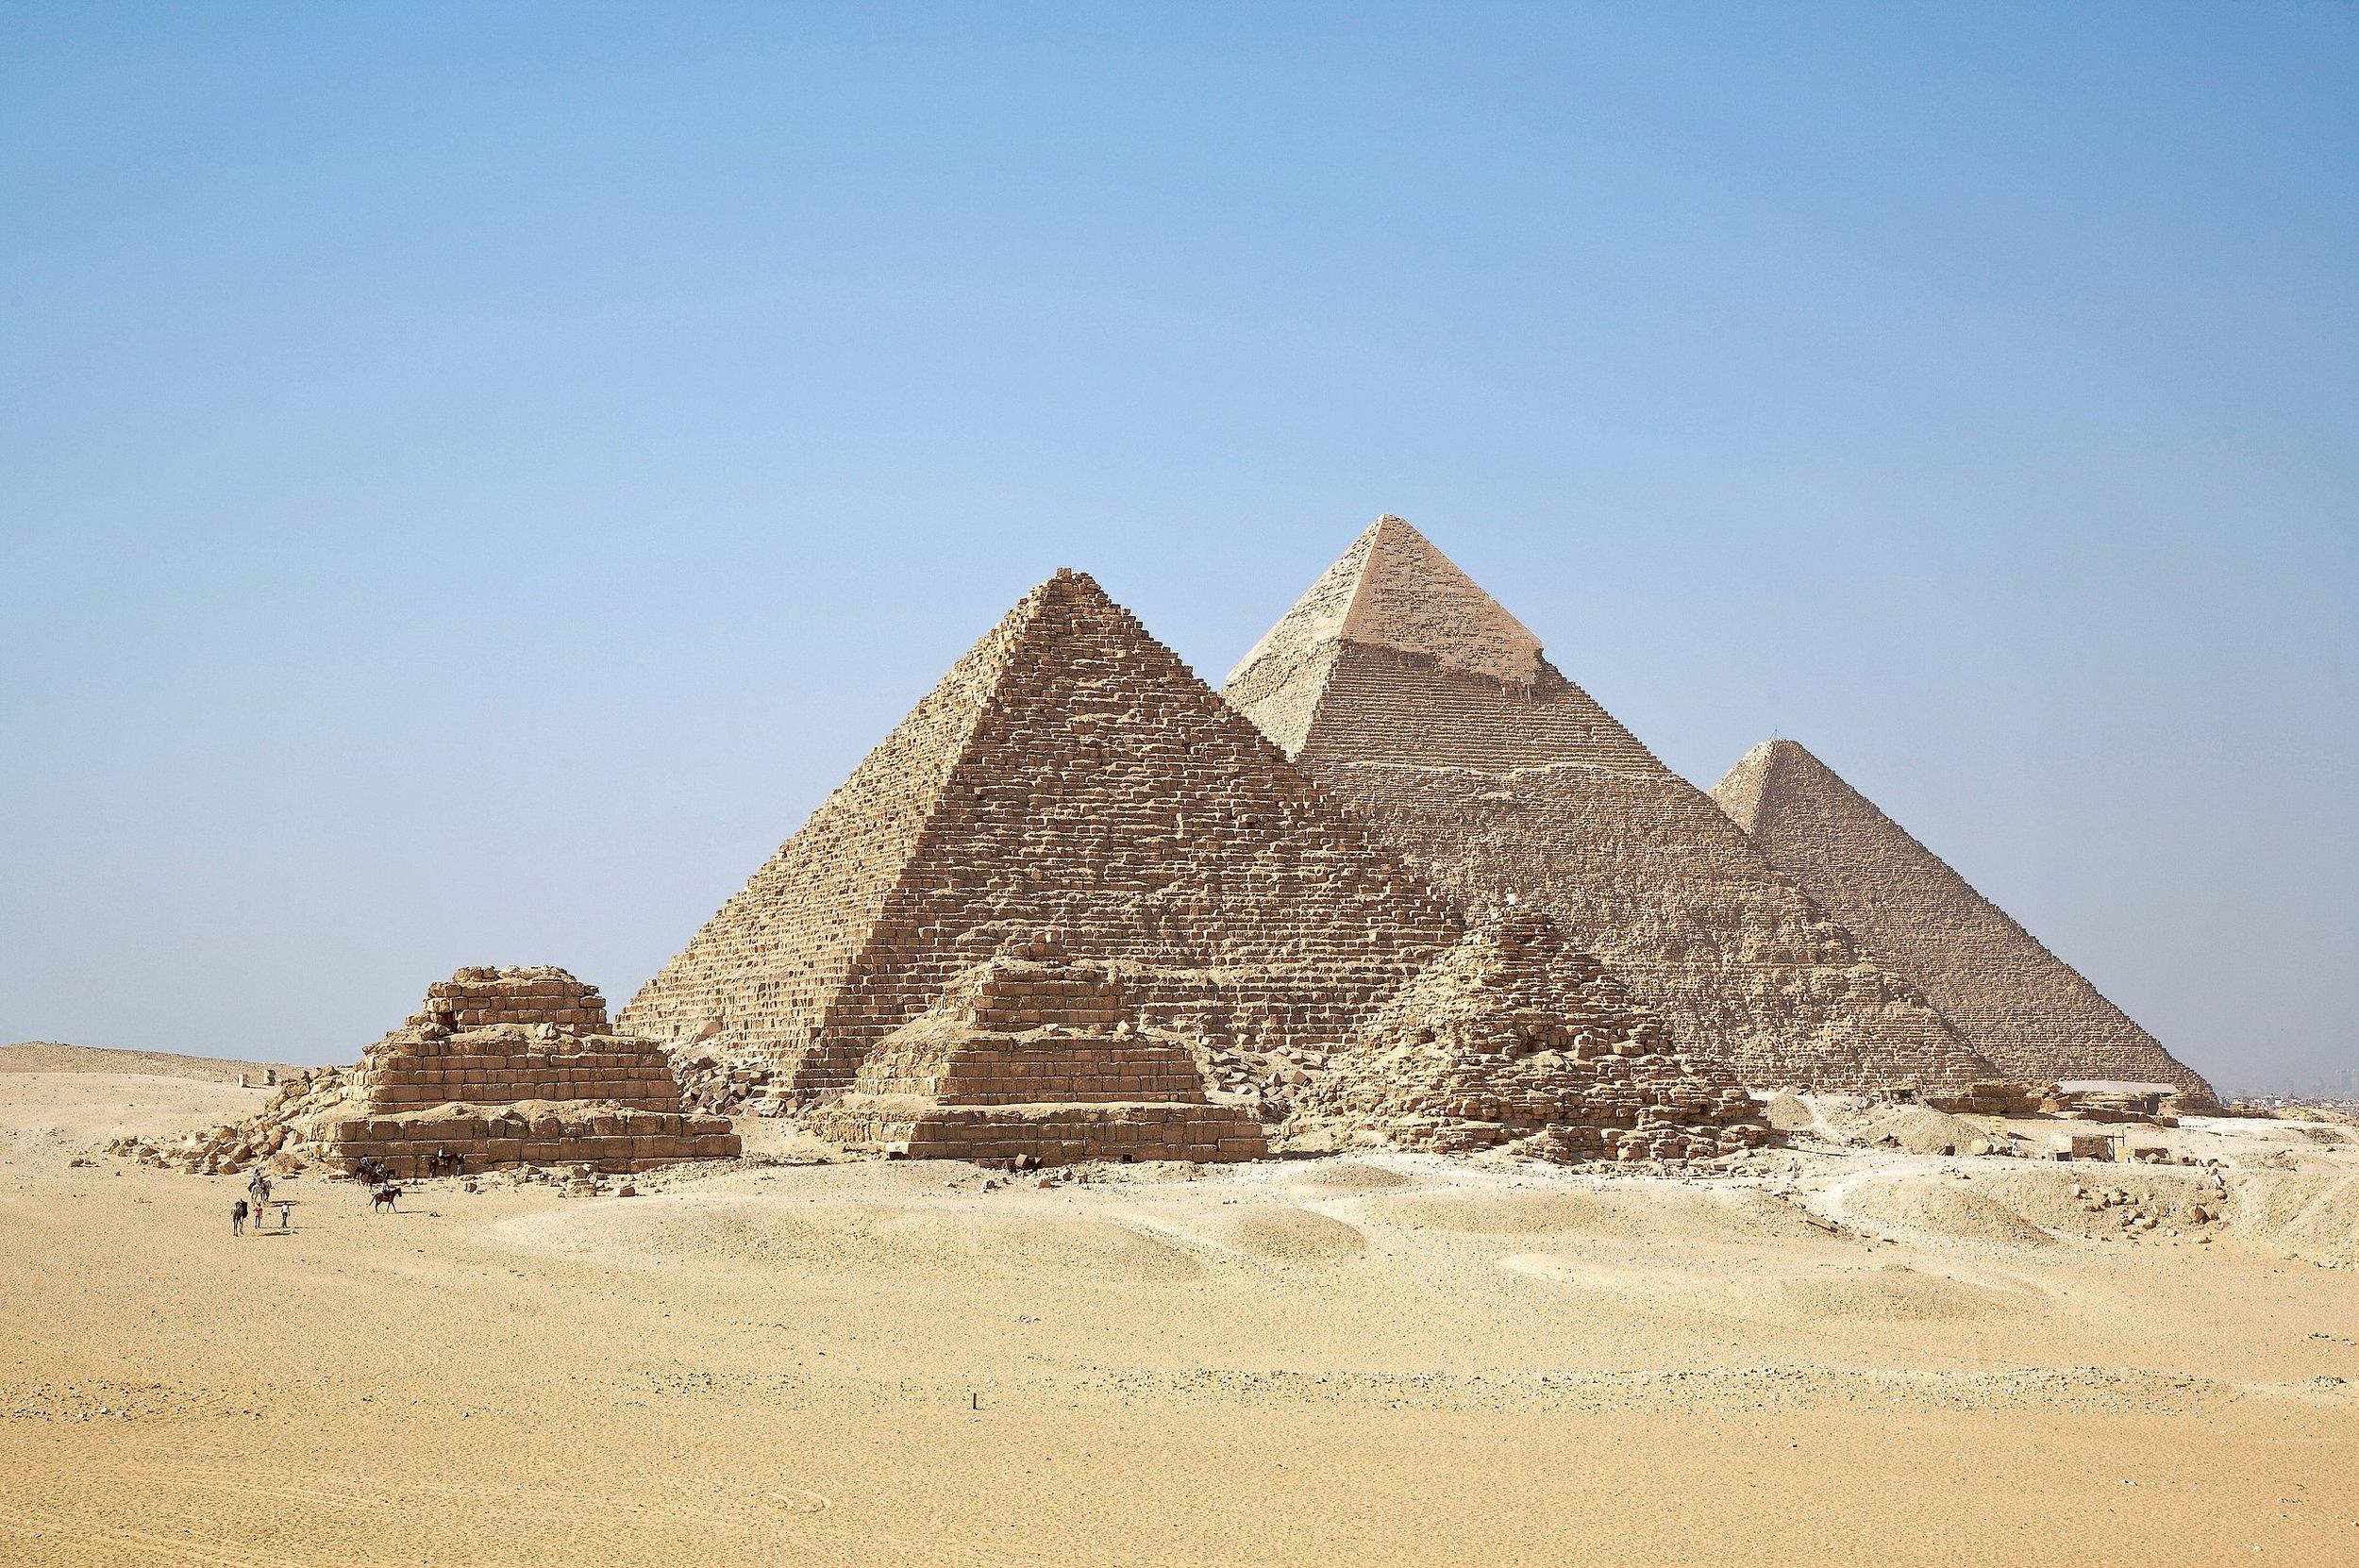 PyramidsOfGiza_1.jpg